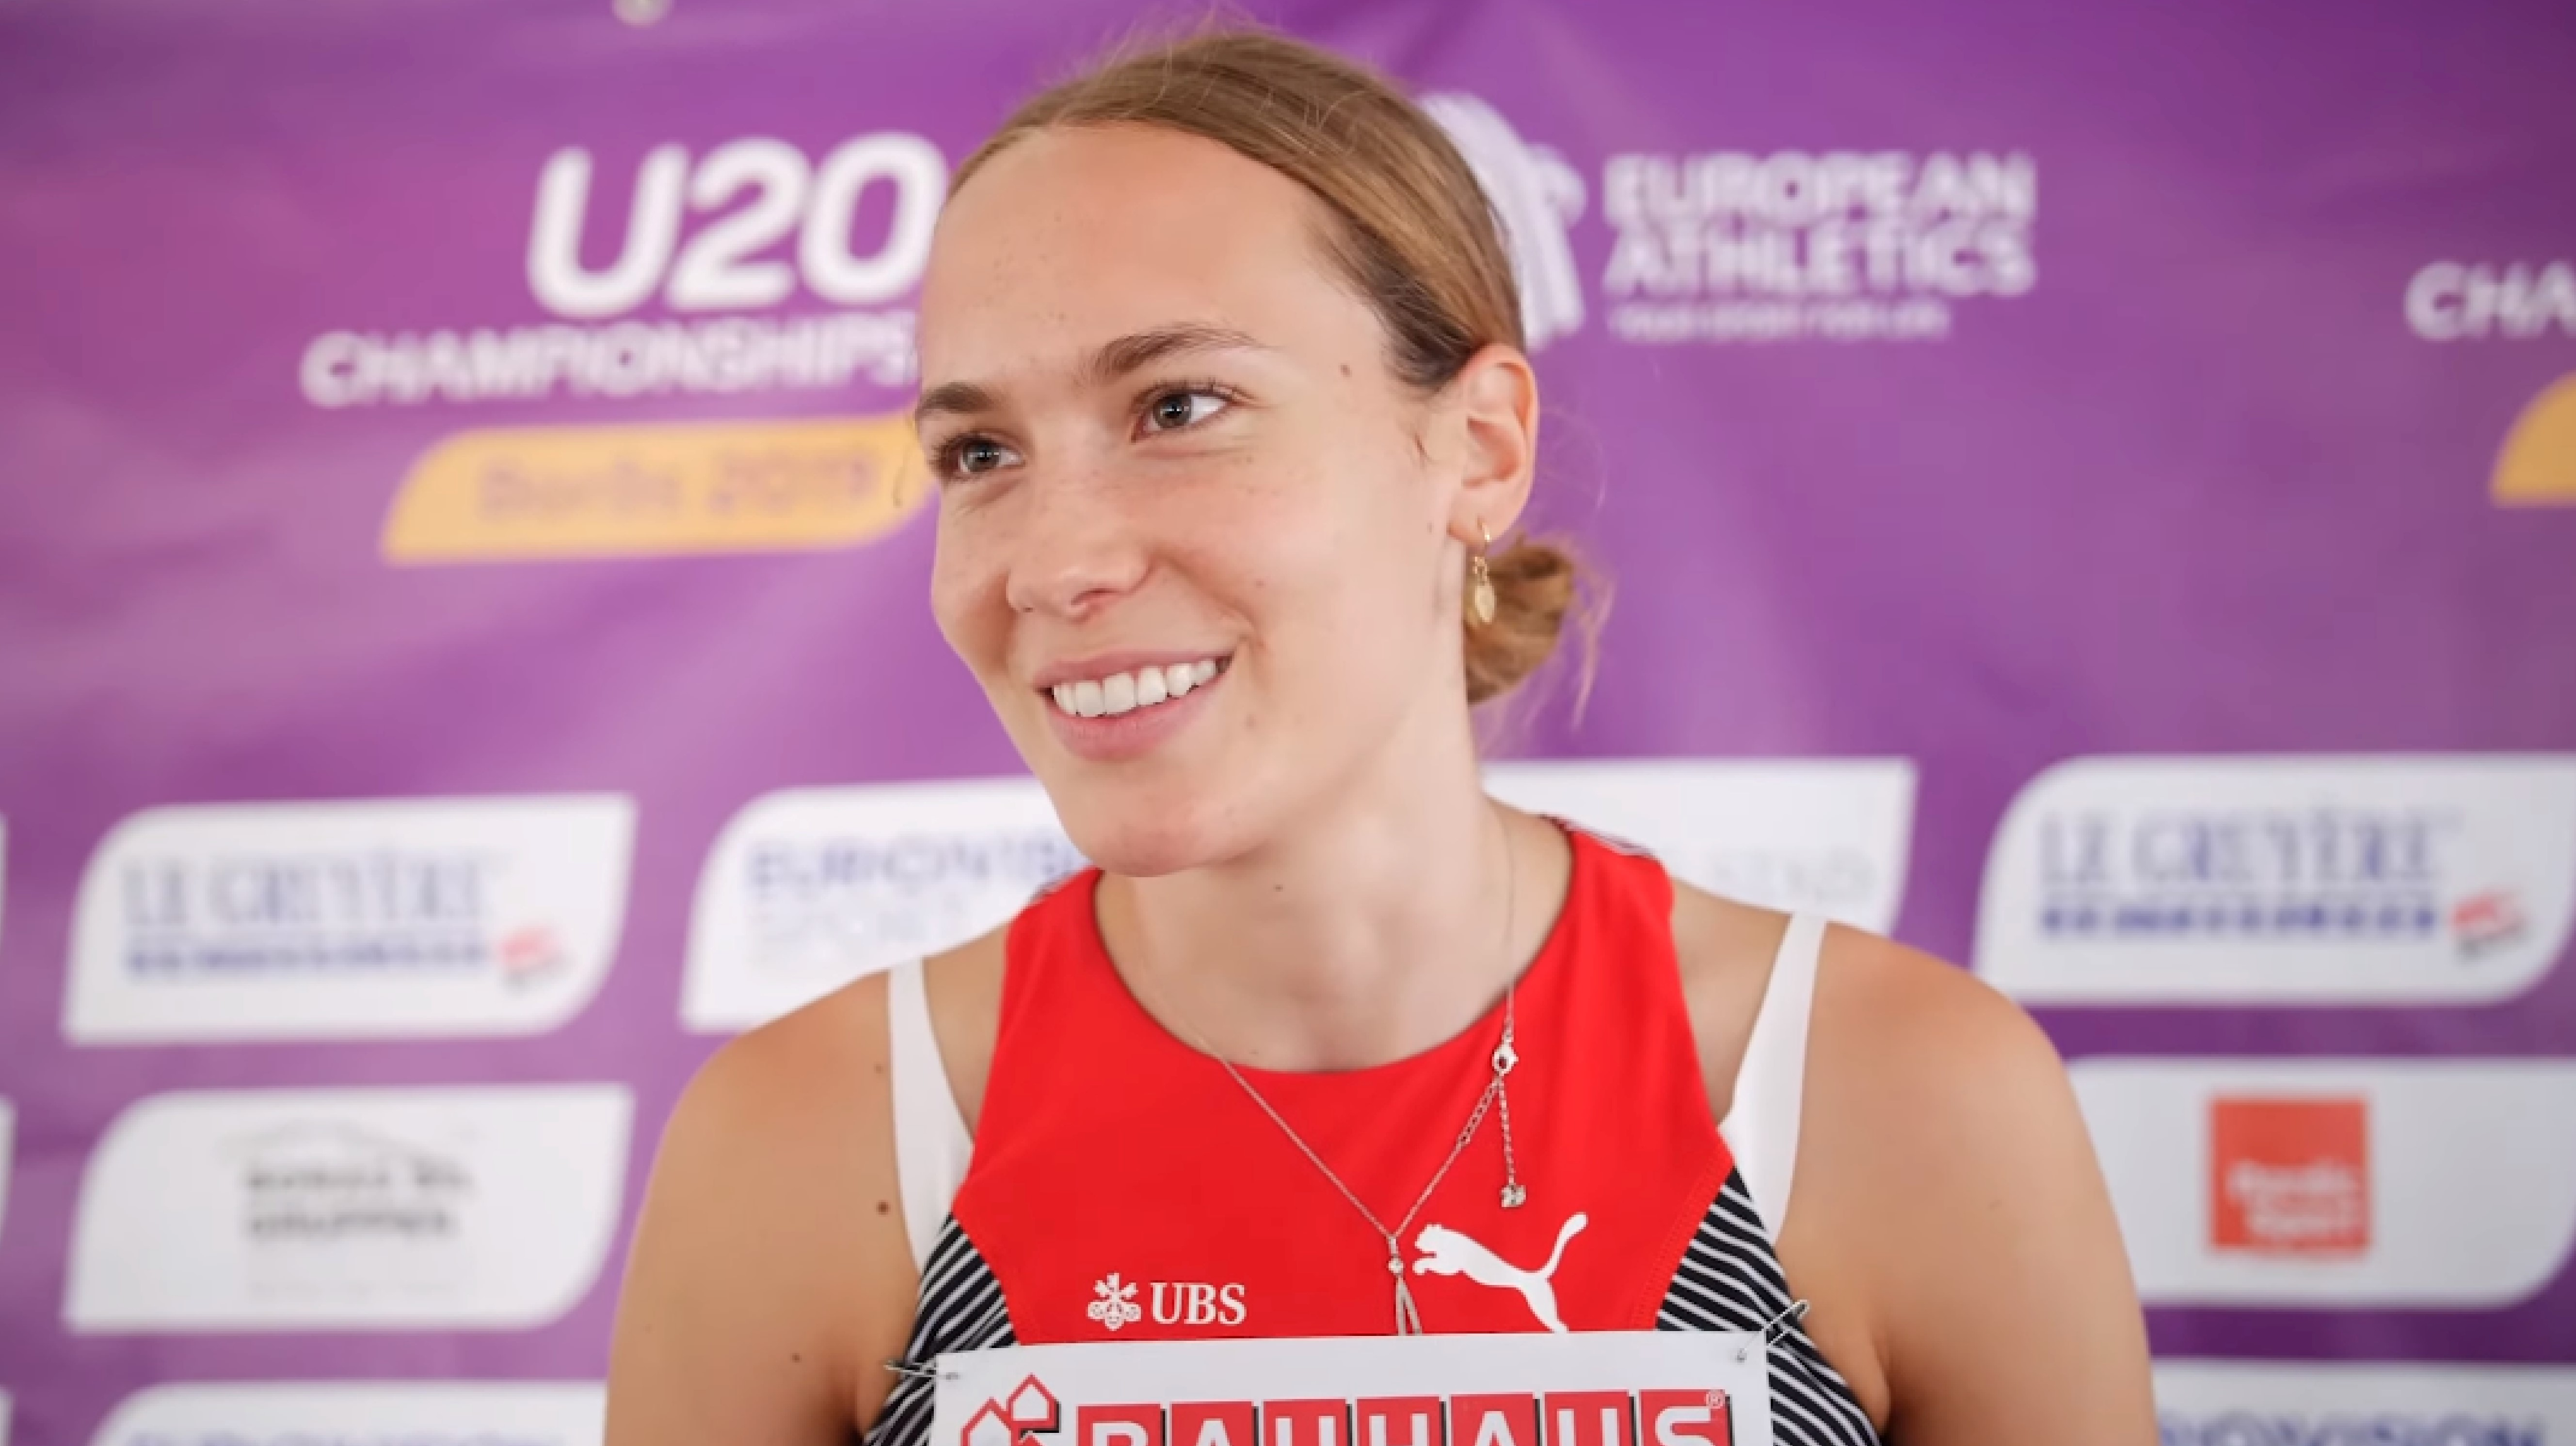 Championnats d'Europe U20 à Boras